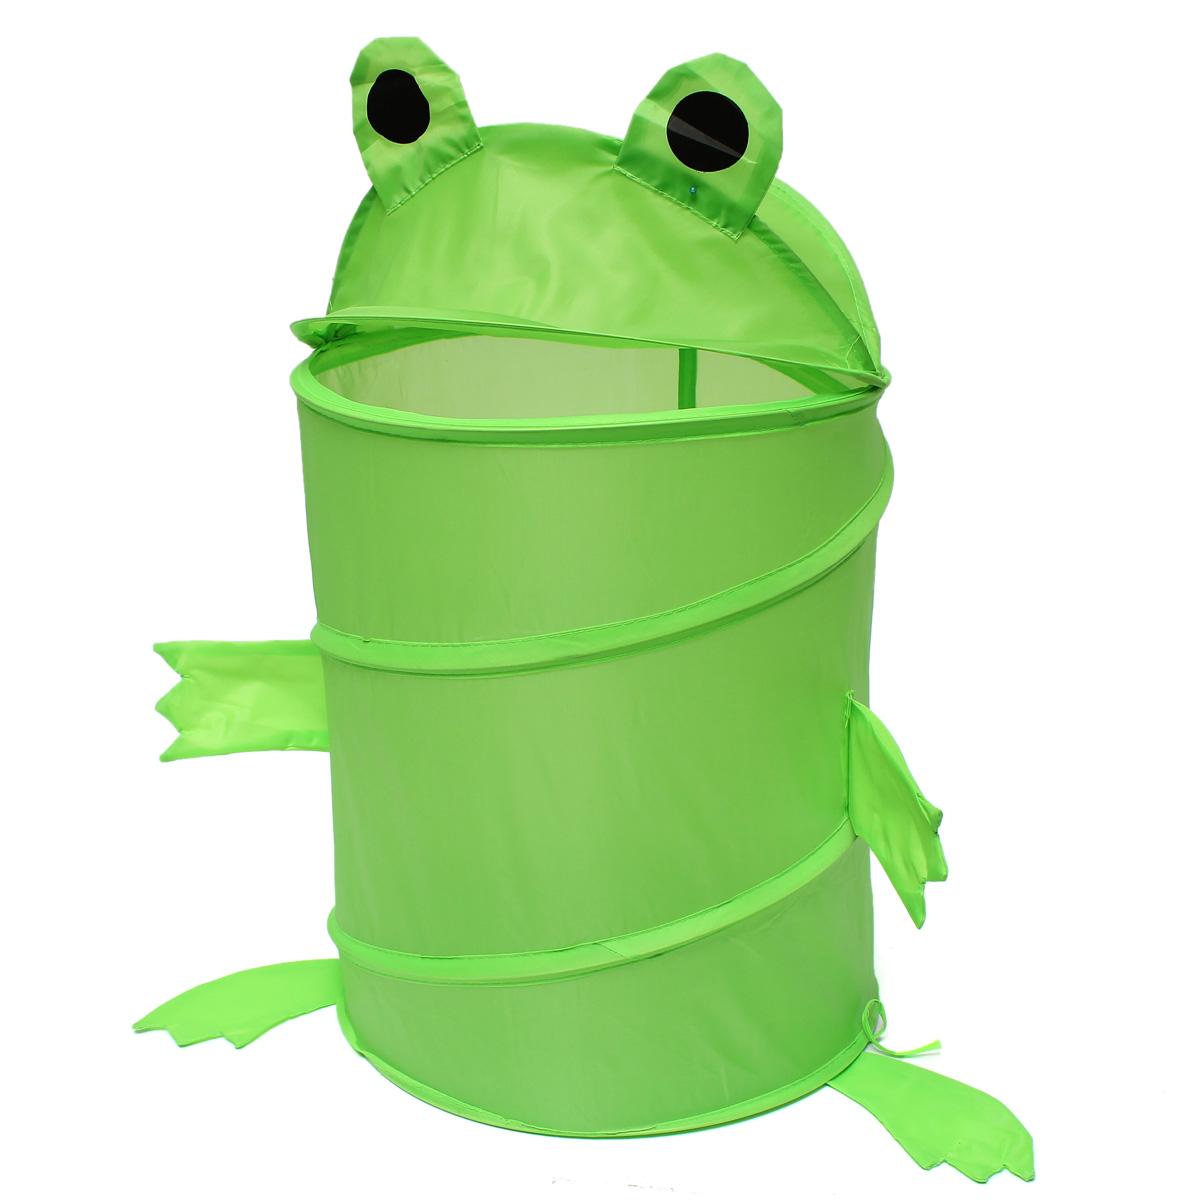 Kids Foldable Laundry Hamper Up Animal Laundry Basket Bag Toys Storage Dirty Washing Clothes & Toy Storage Organizer (Two Types)